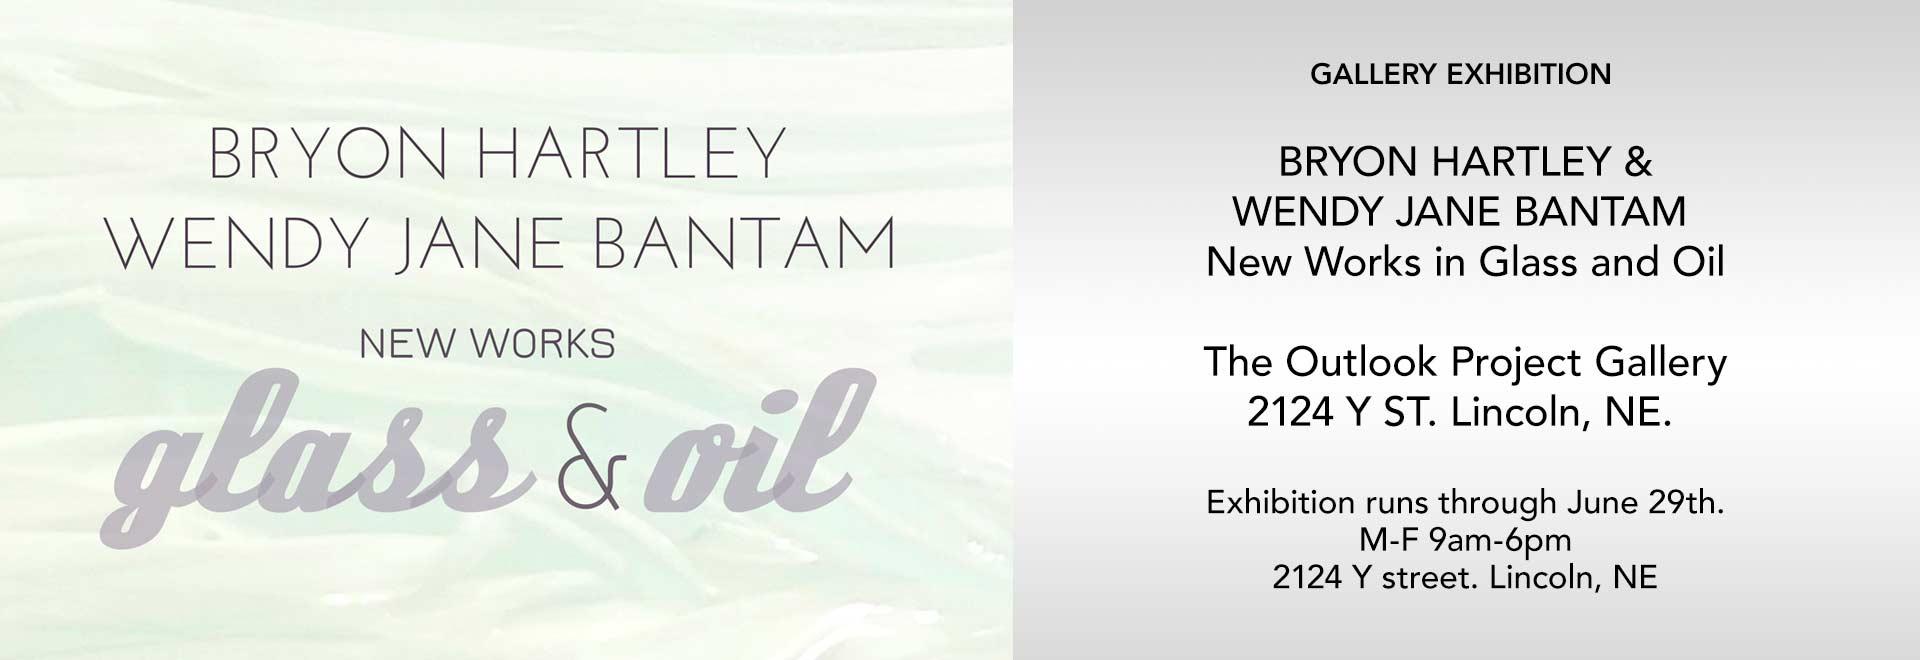 Wendy Bantam Gallery Exhibition